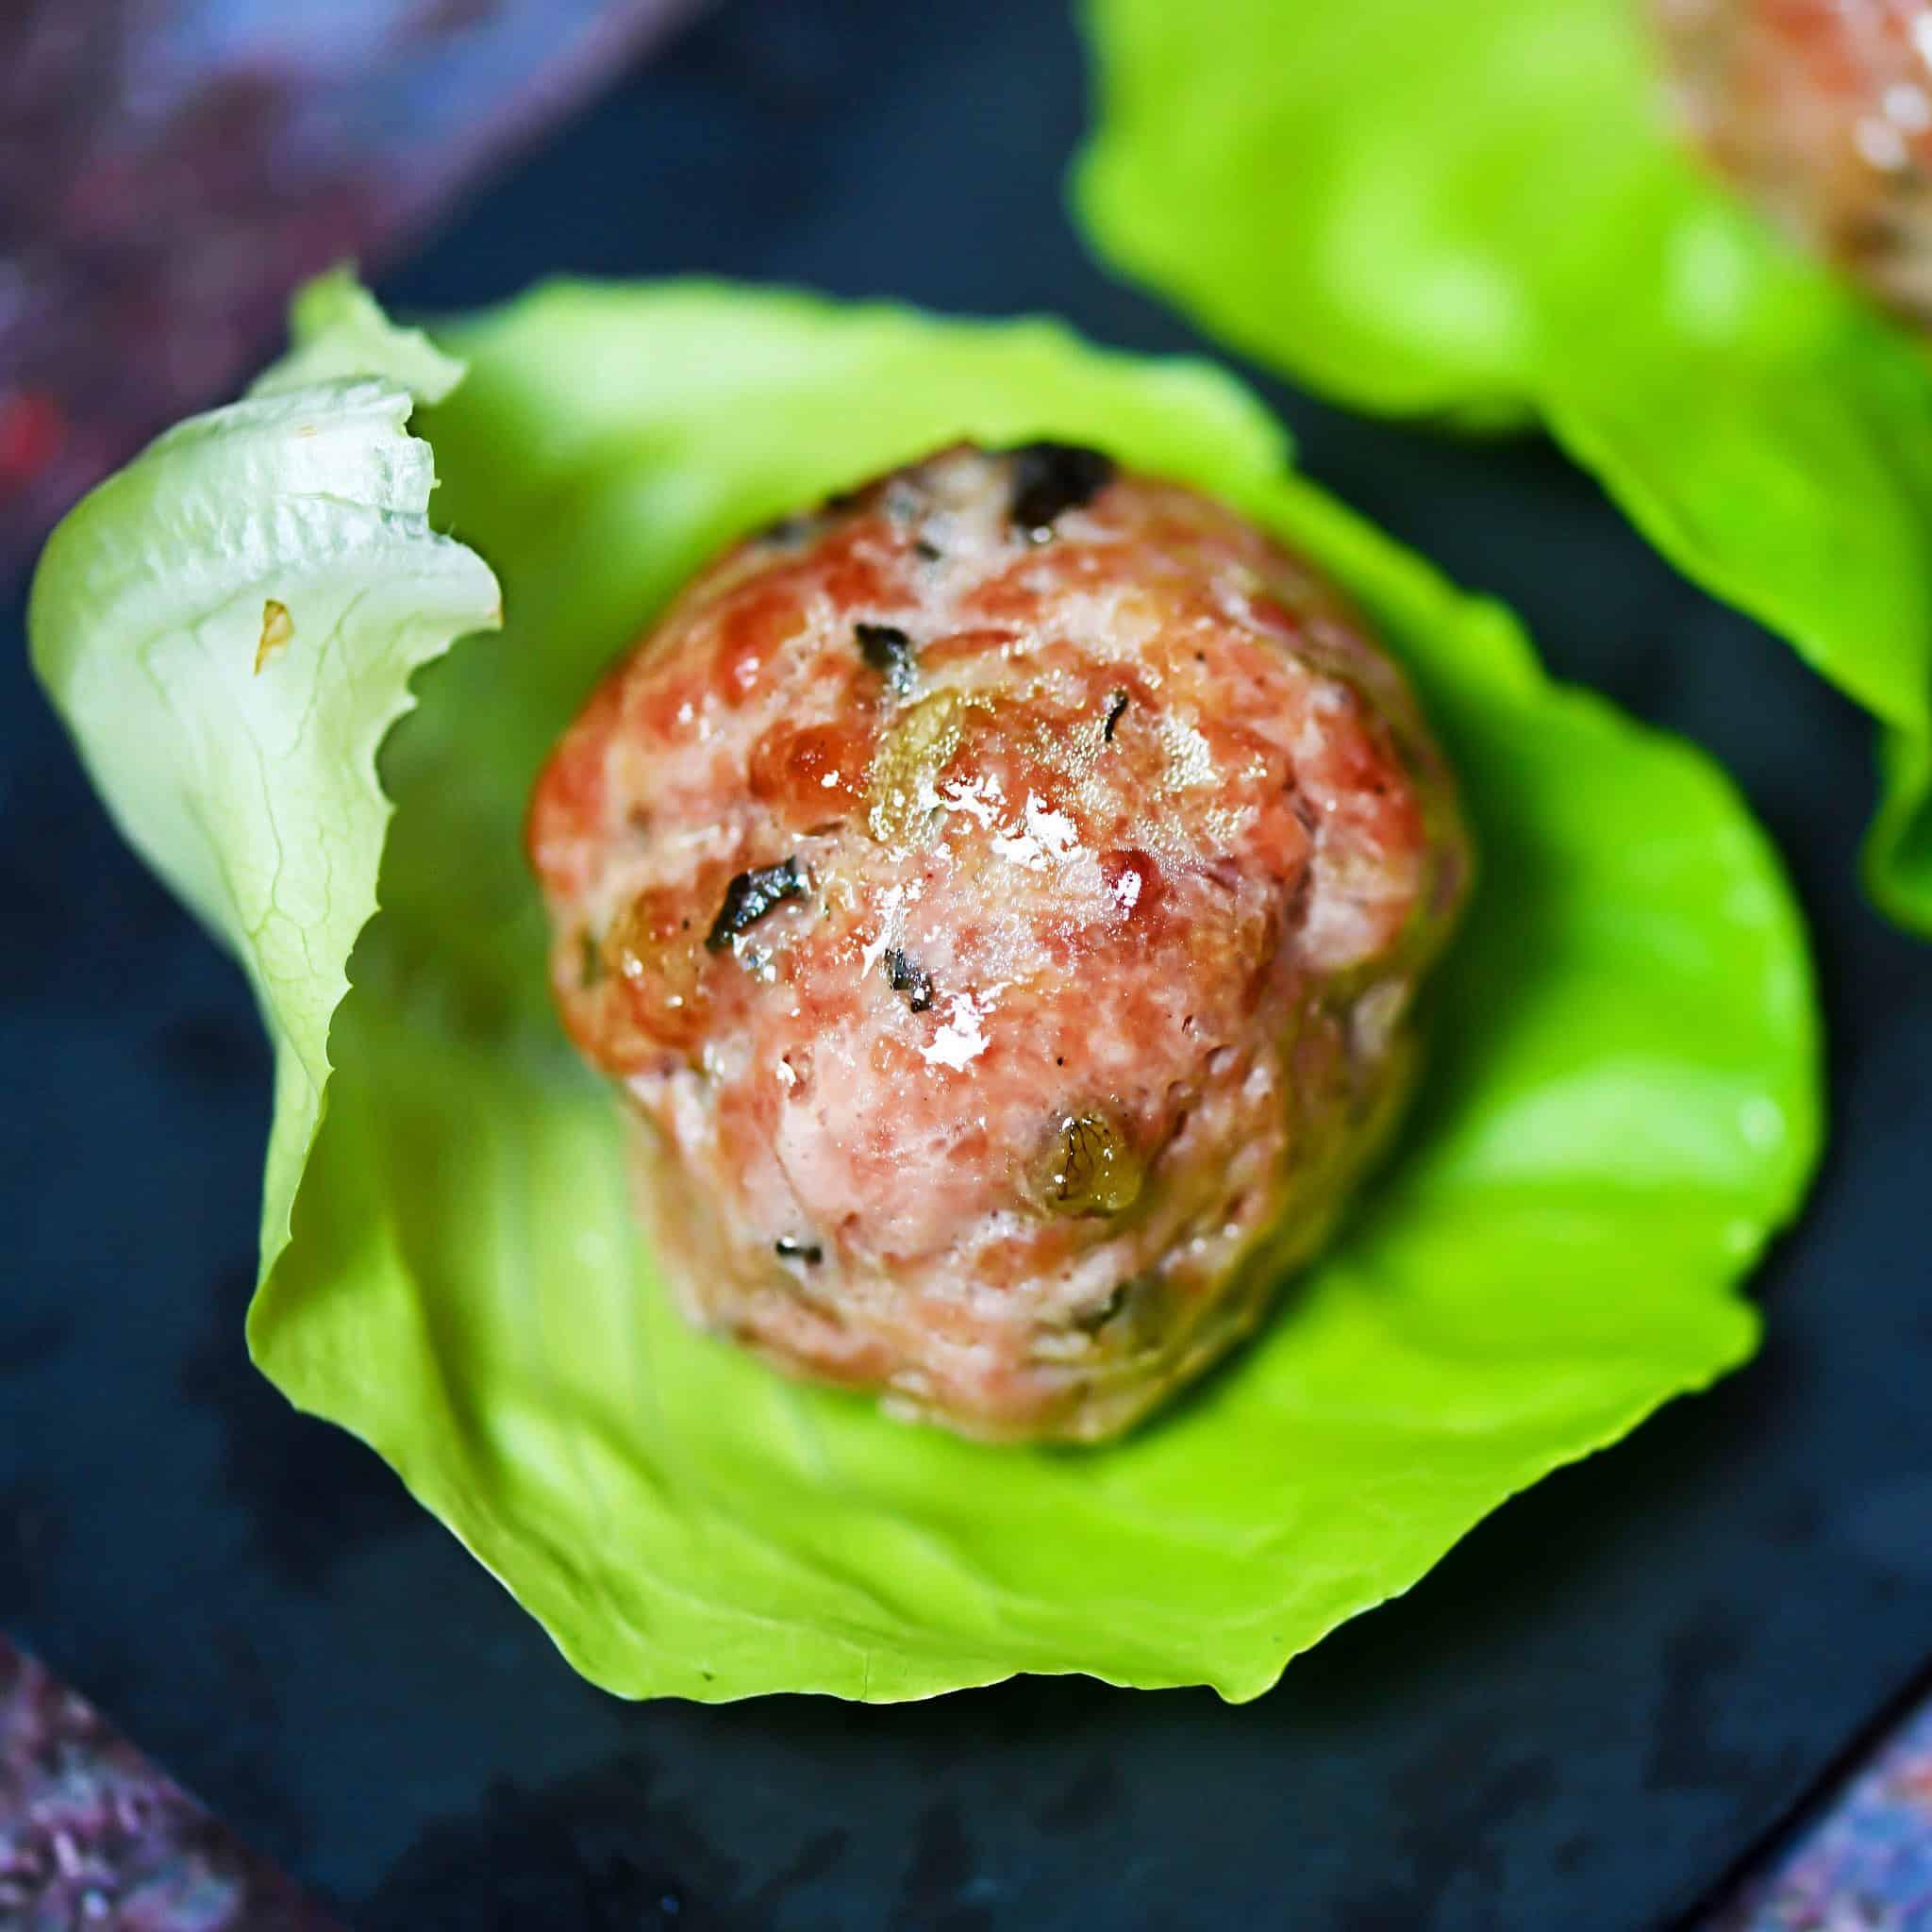 Meatballs with bib lettuce